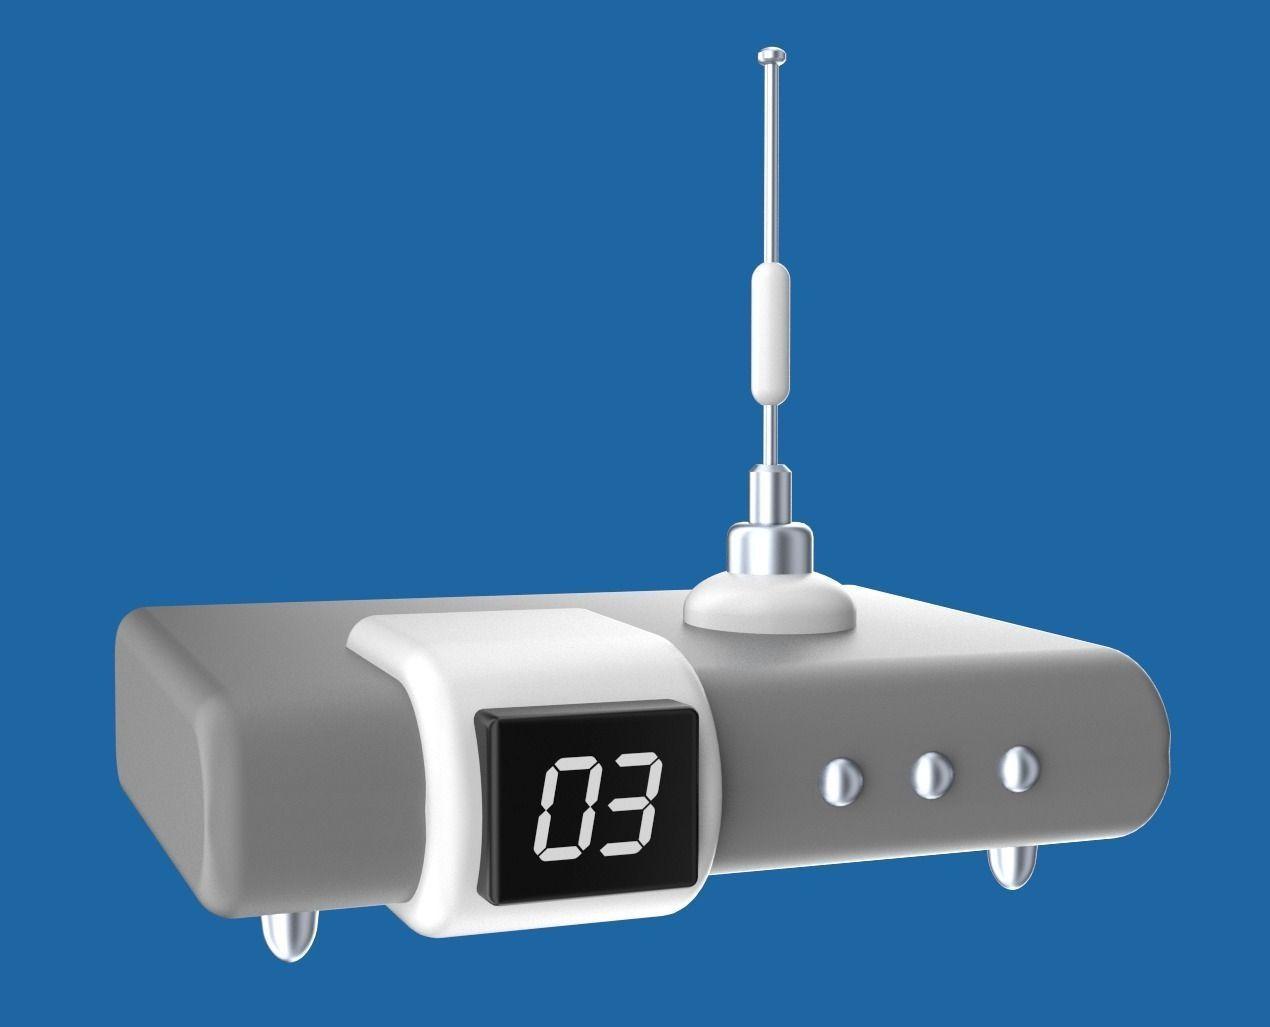 Cartoony electronic device